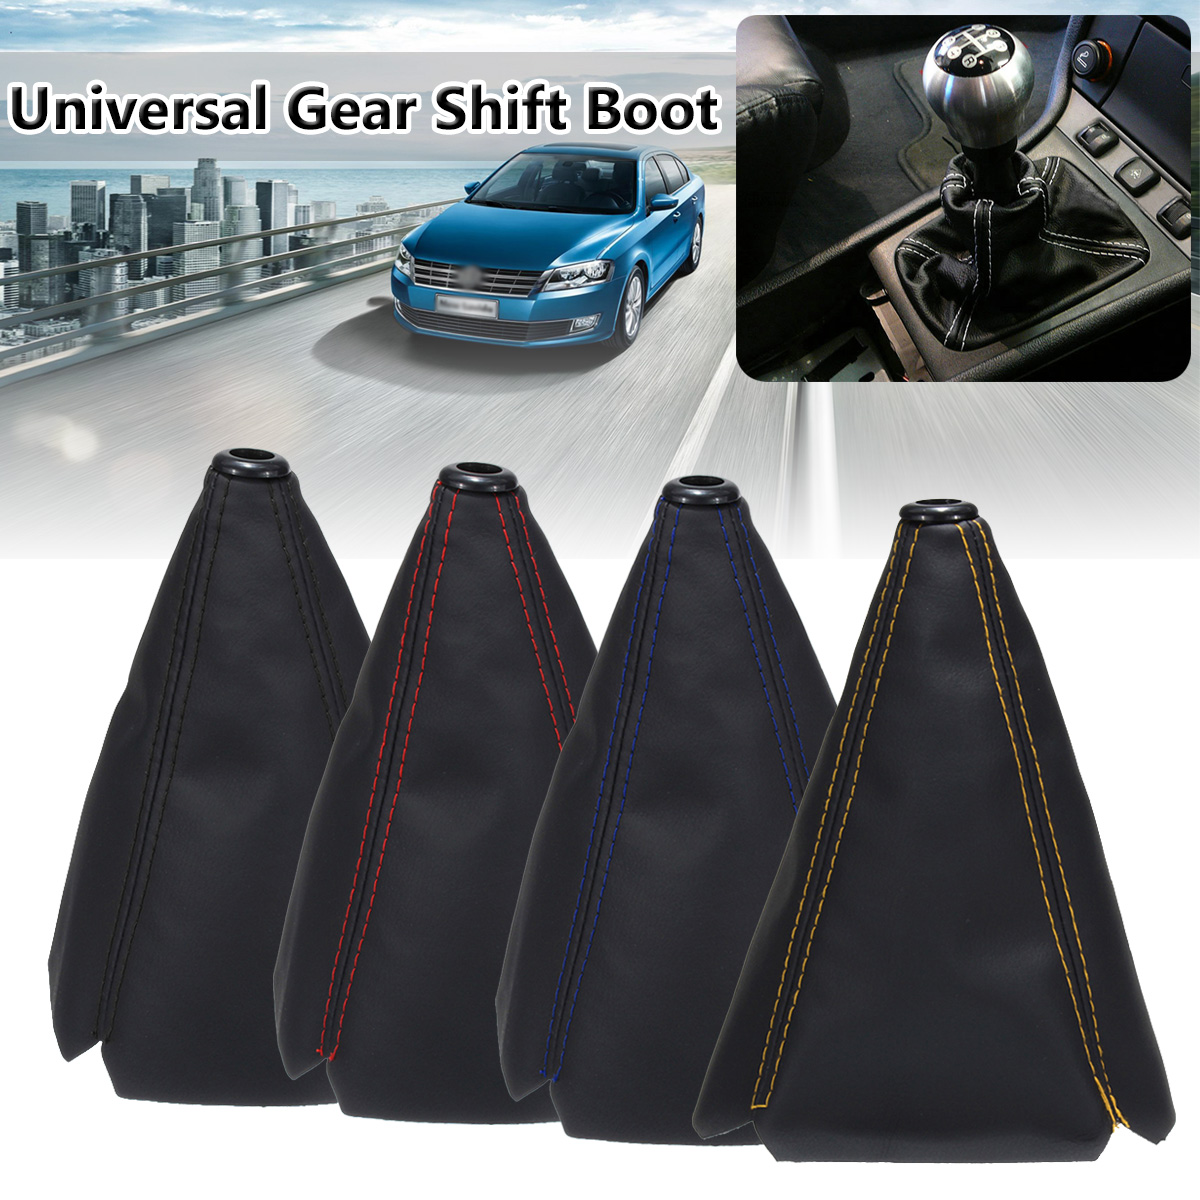 Auto-Gear-Shift-Collars Boot-Cover Gaiter Shifter-Gear Manual Carbon-Fiber Universal